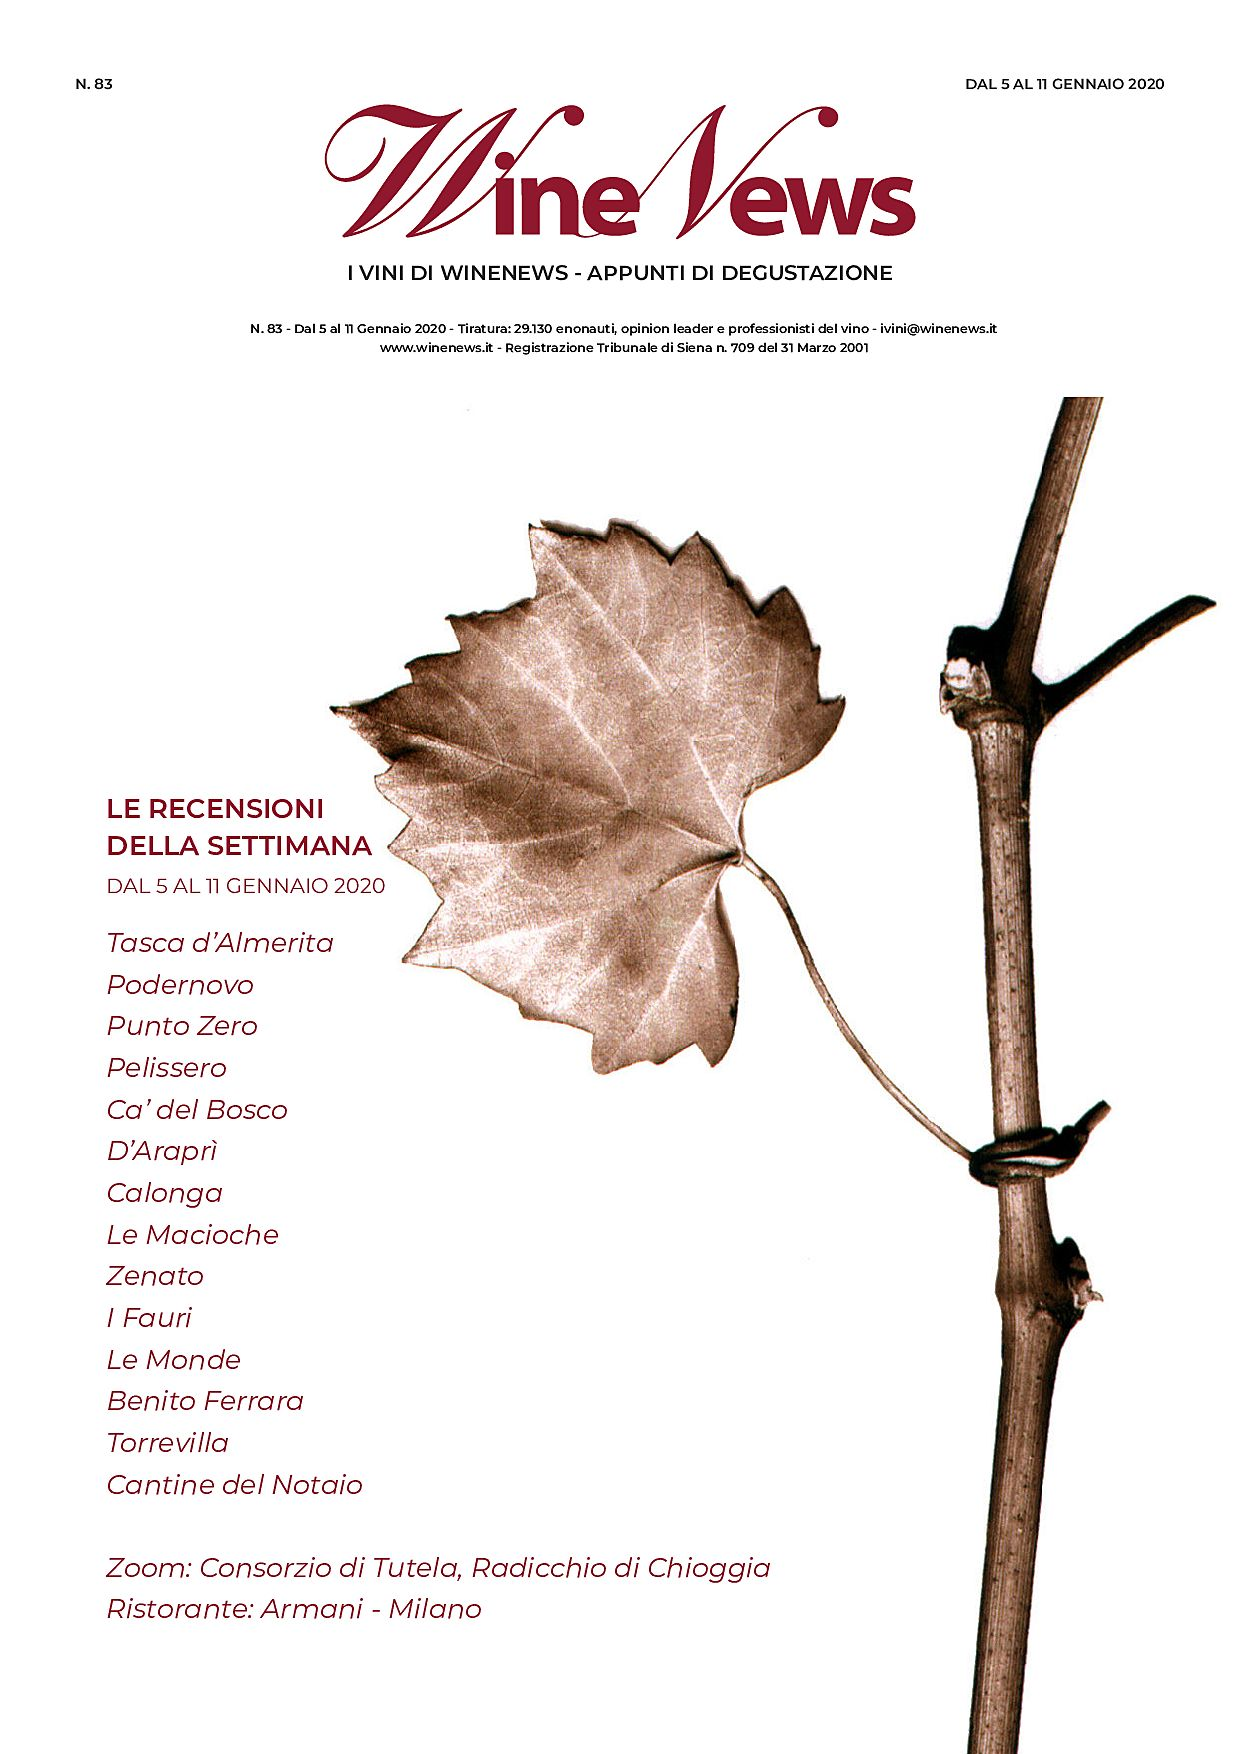 https://winenews.it/php/redirect_pdf.php?id=407050&t=1578066119